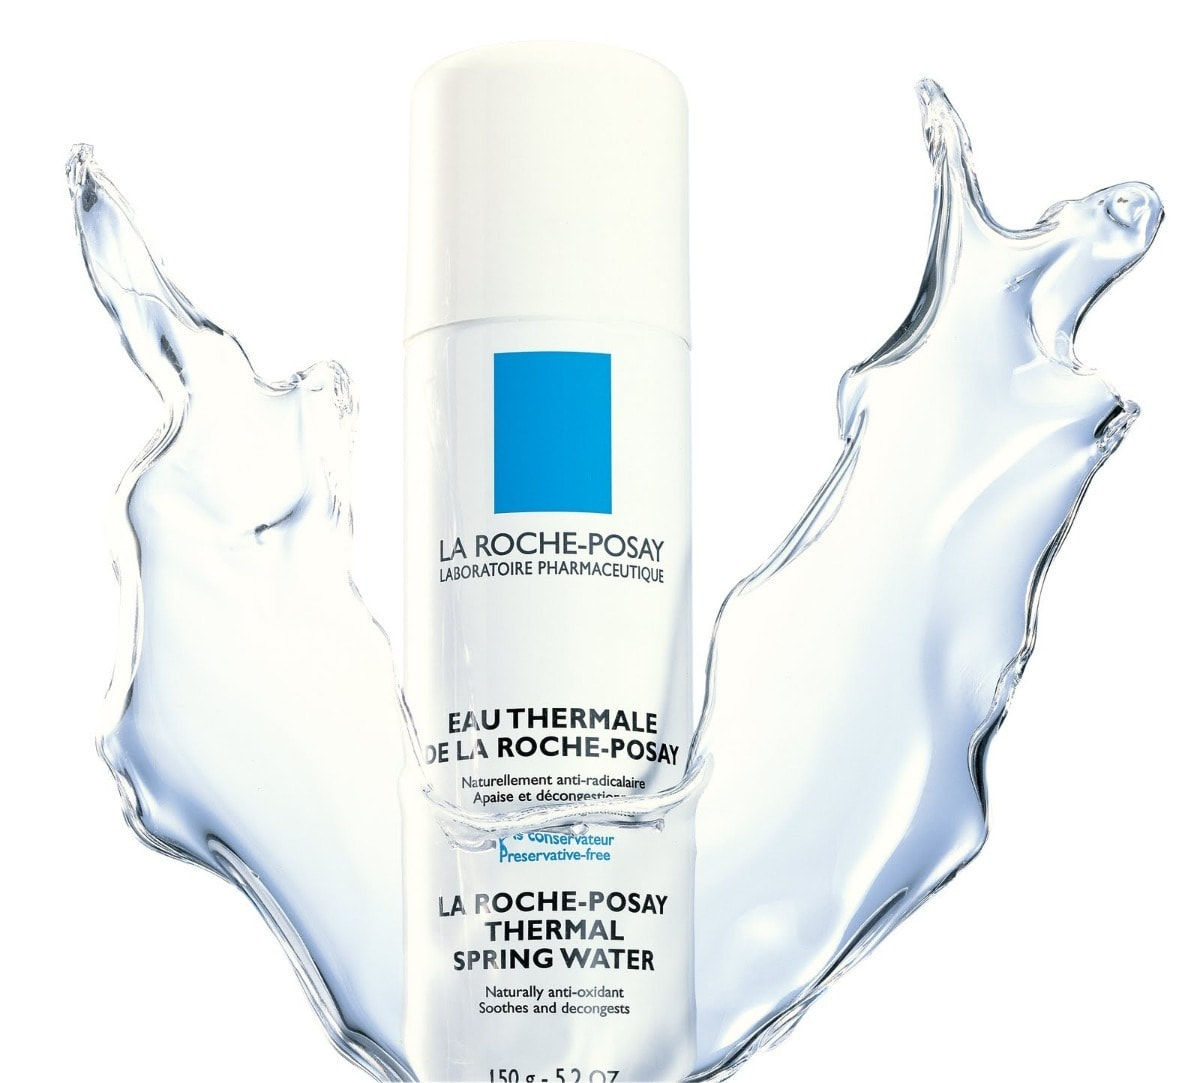 agua-termal-la-roche-posay-50-ml_mlb-f-3004826344_082012